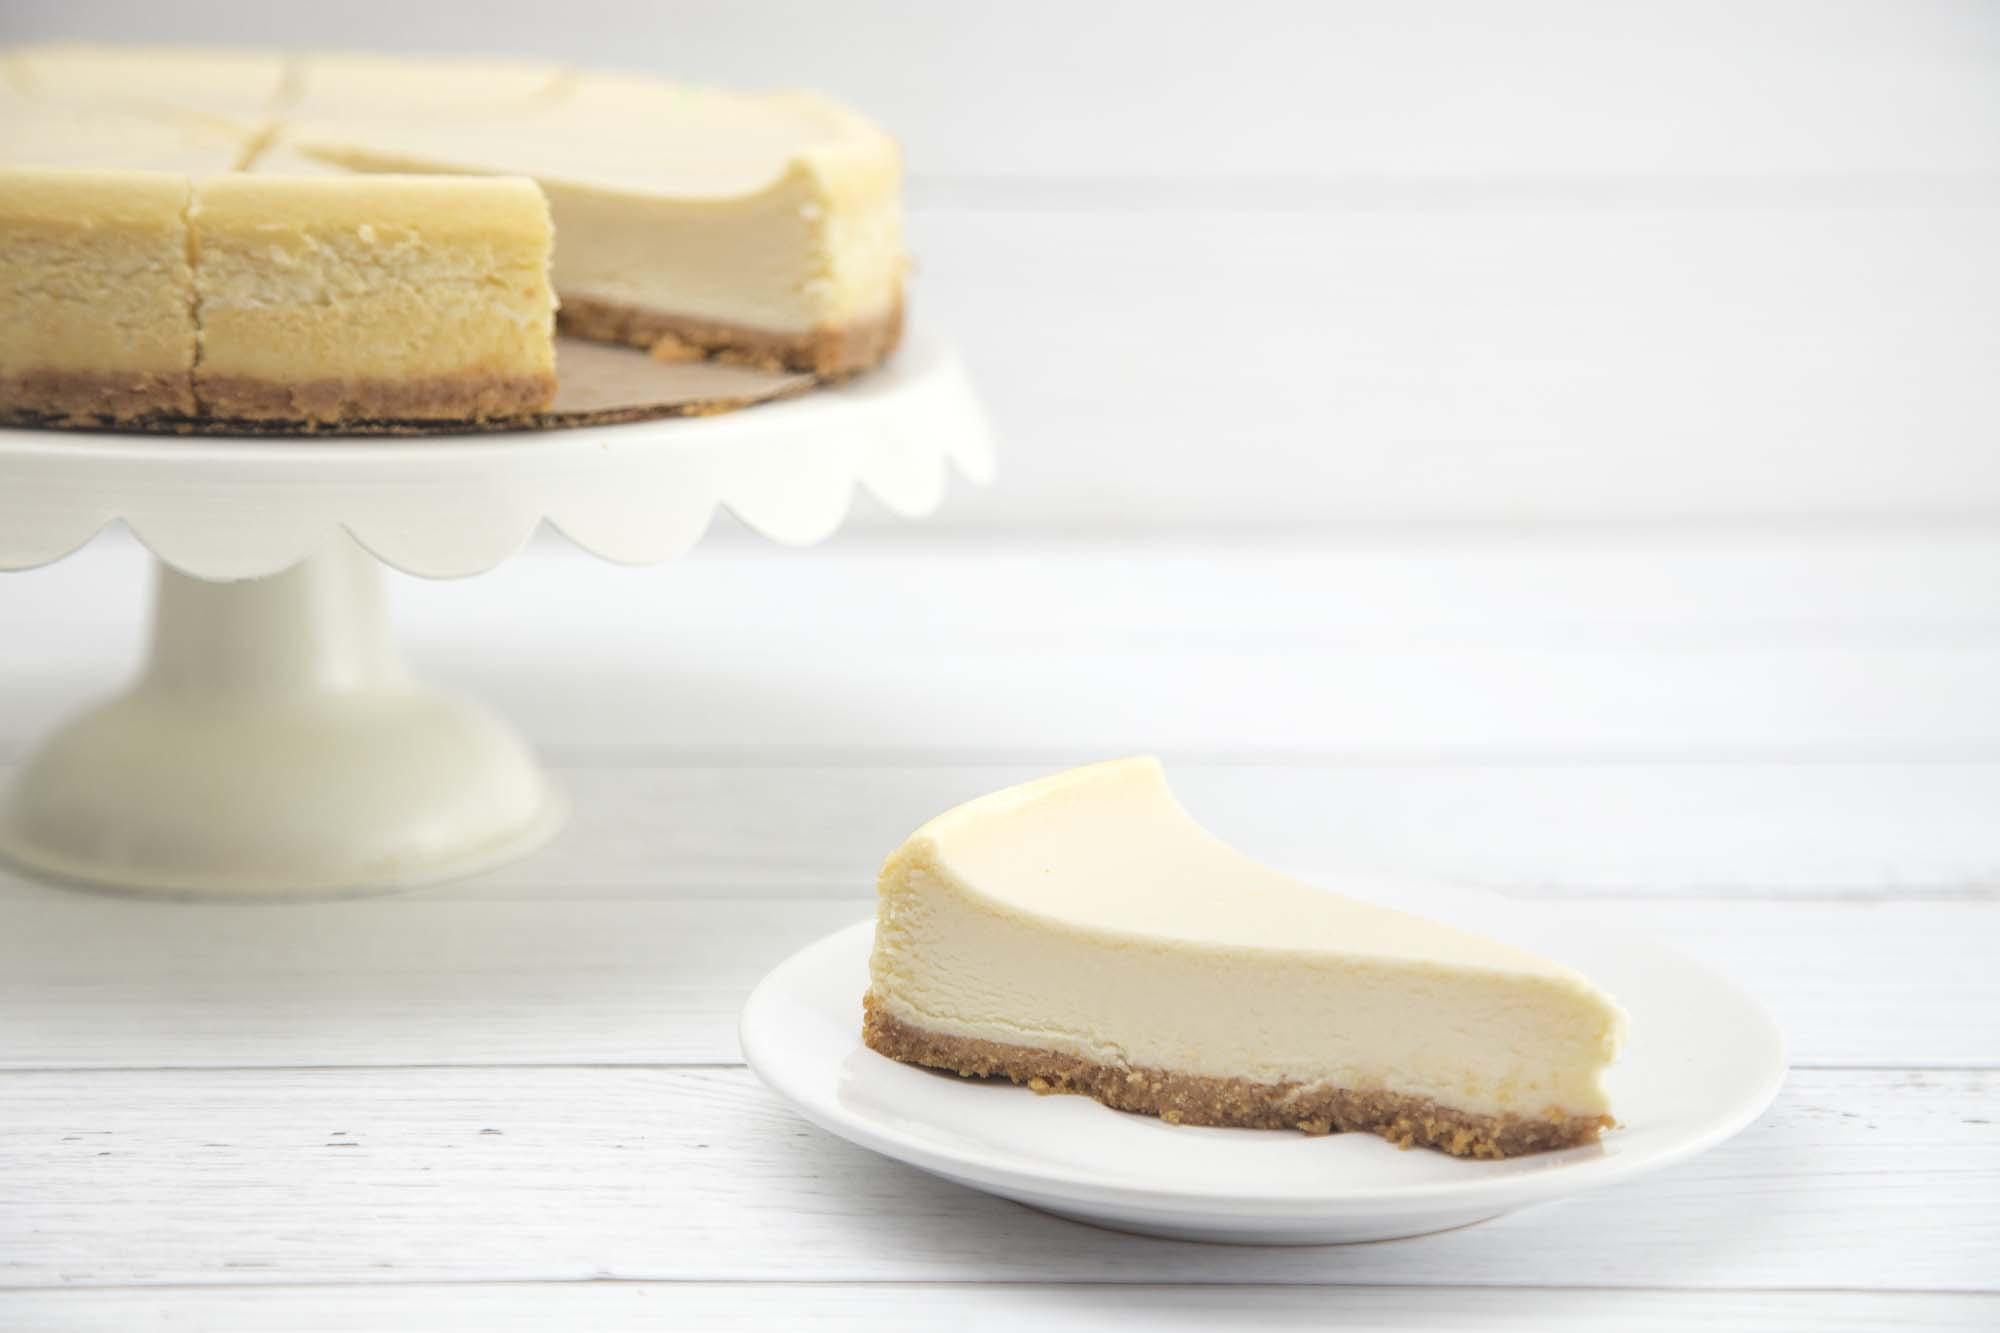 Bagt cheesecake - New York style